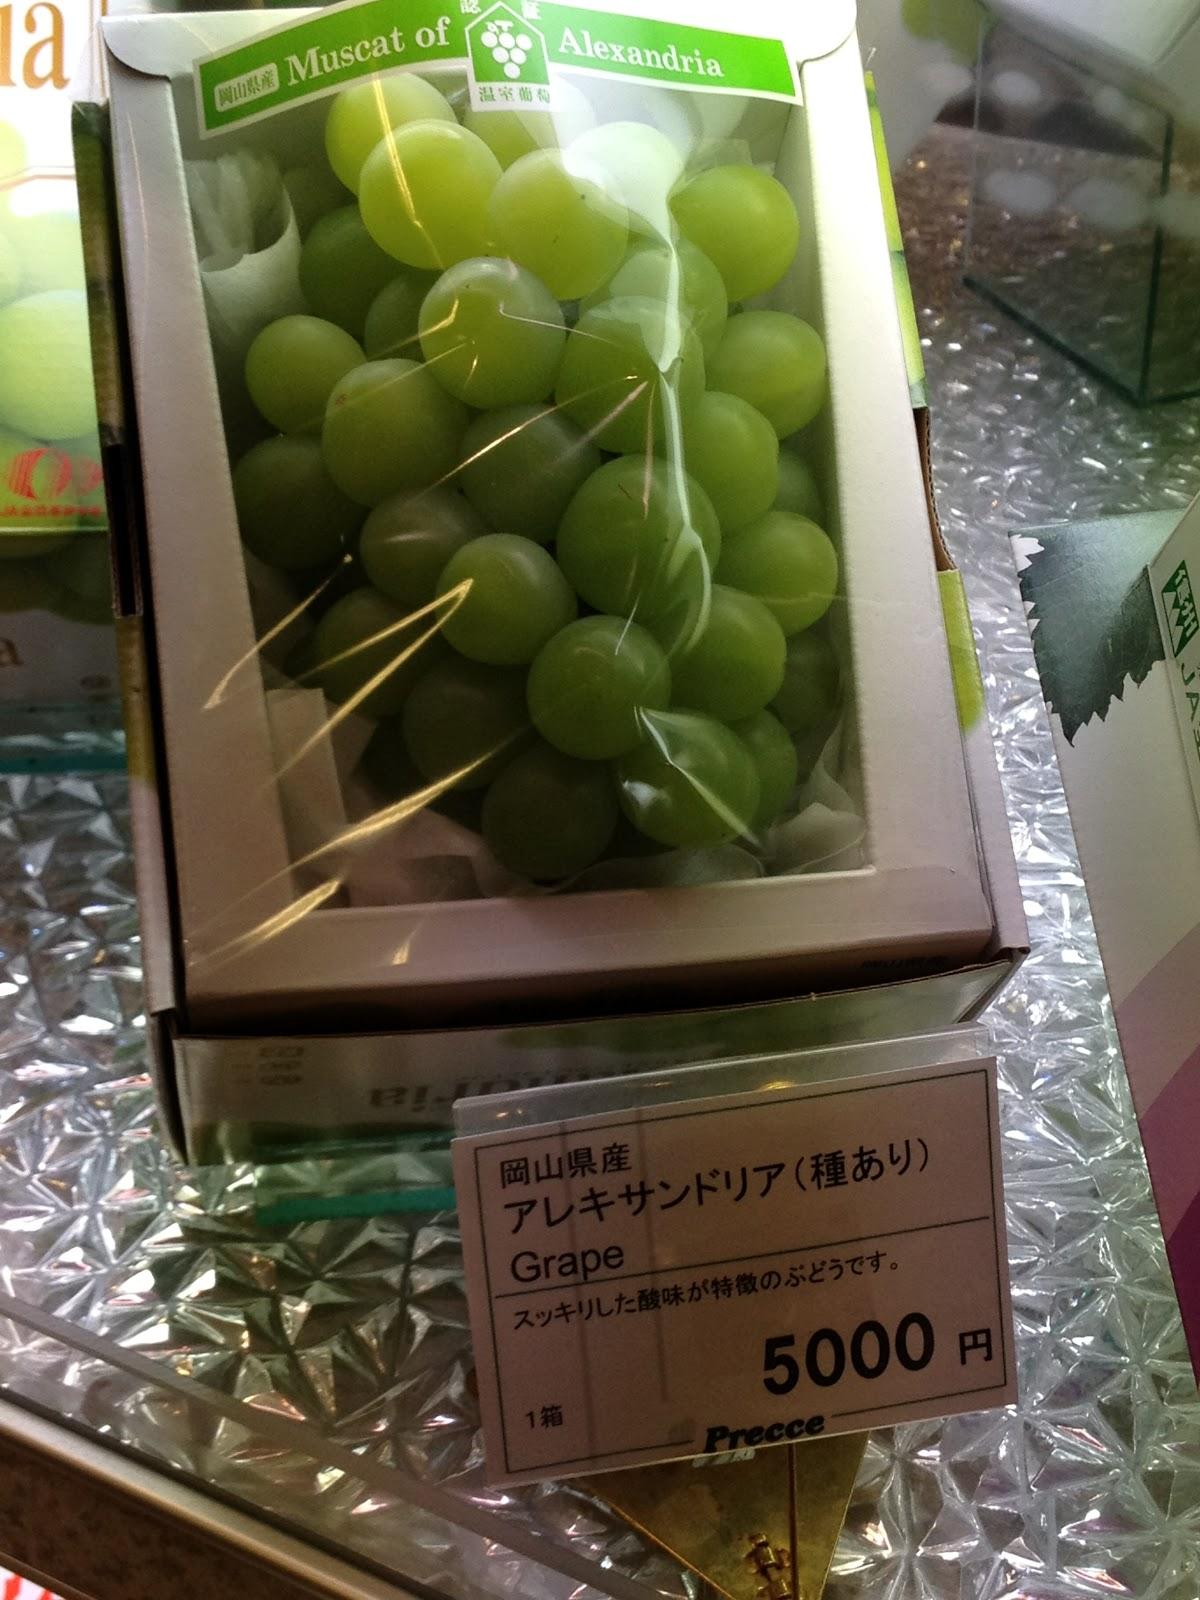 Ossessioni di frutta (7)